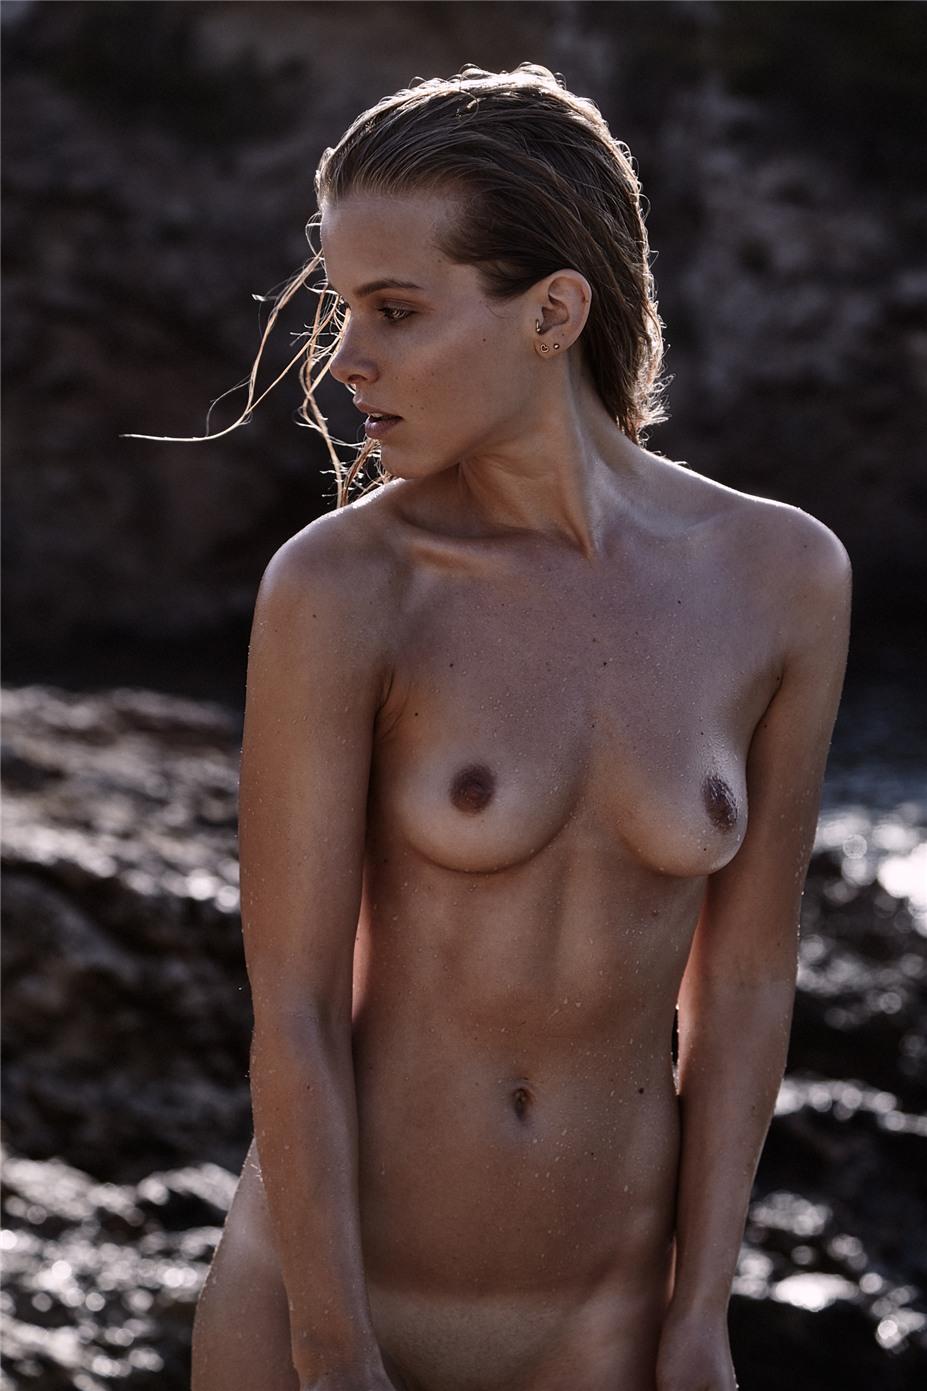 Обнаженные девушки на пляжах Ибицы / Ibiza Nudes by Diane Betties - Hanne